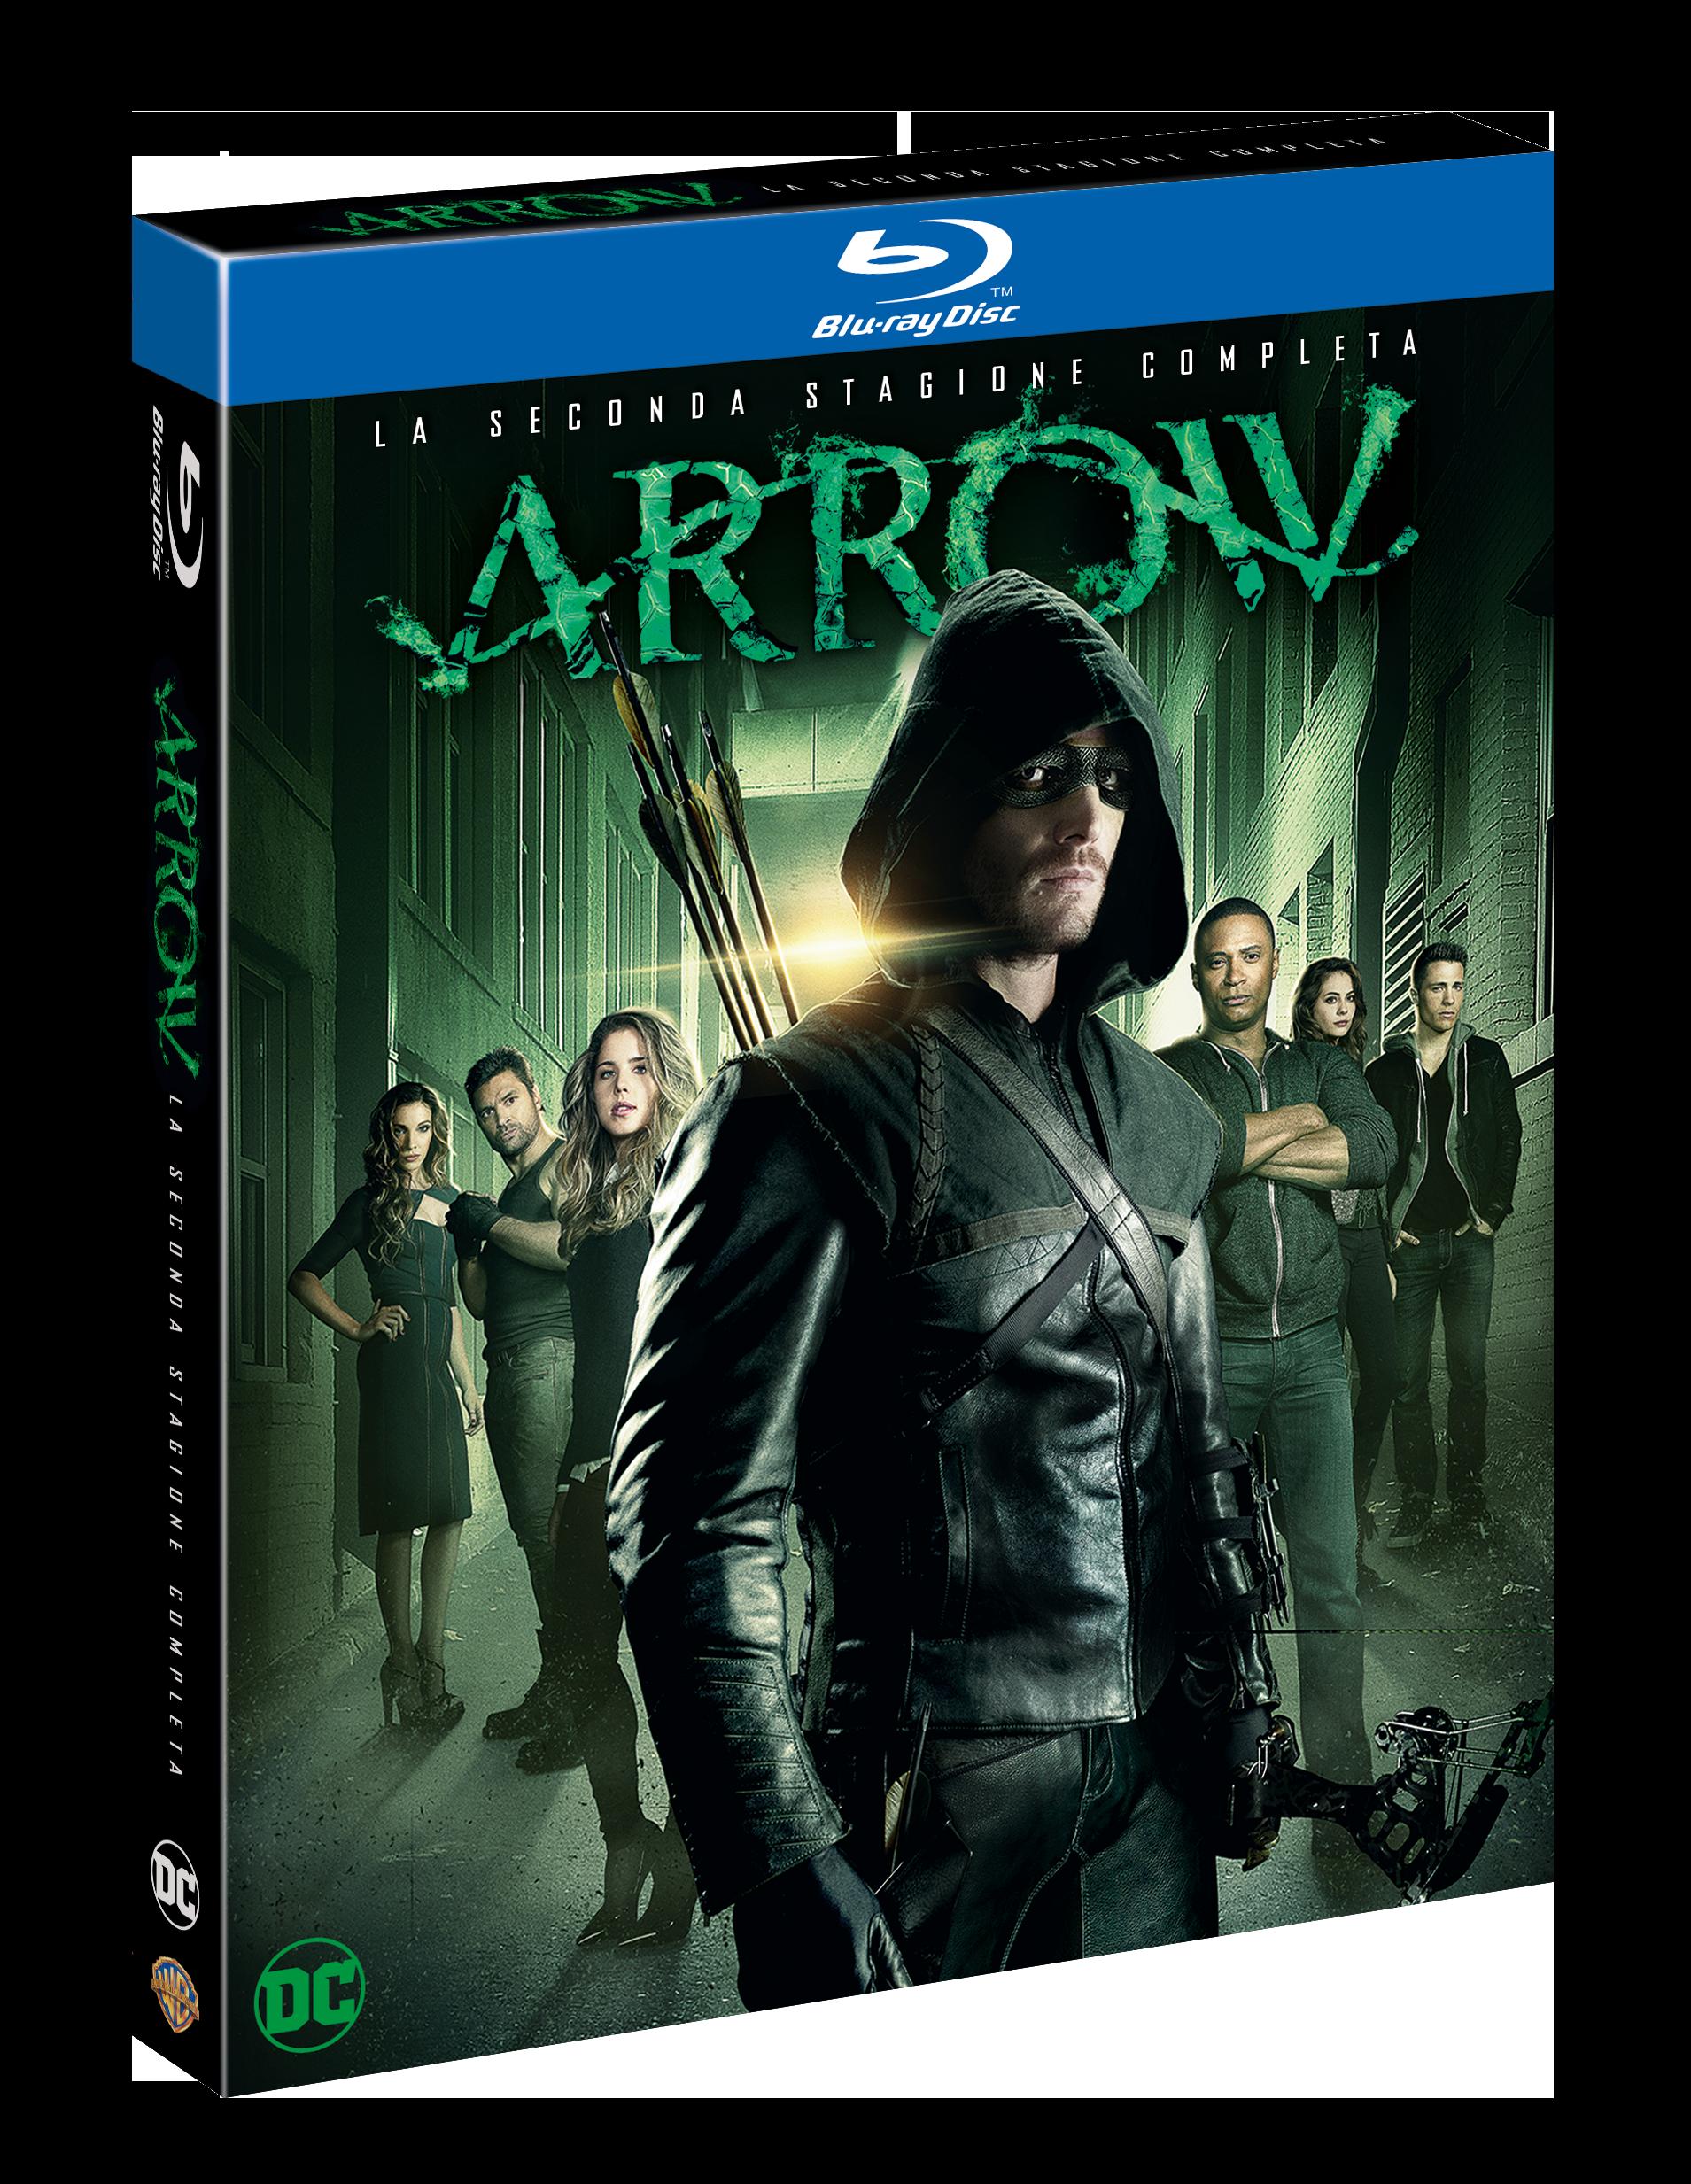 Arrow S2 bd sc 3d